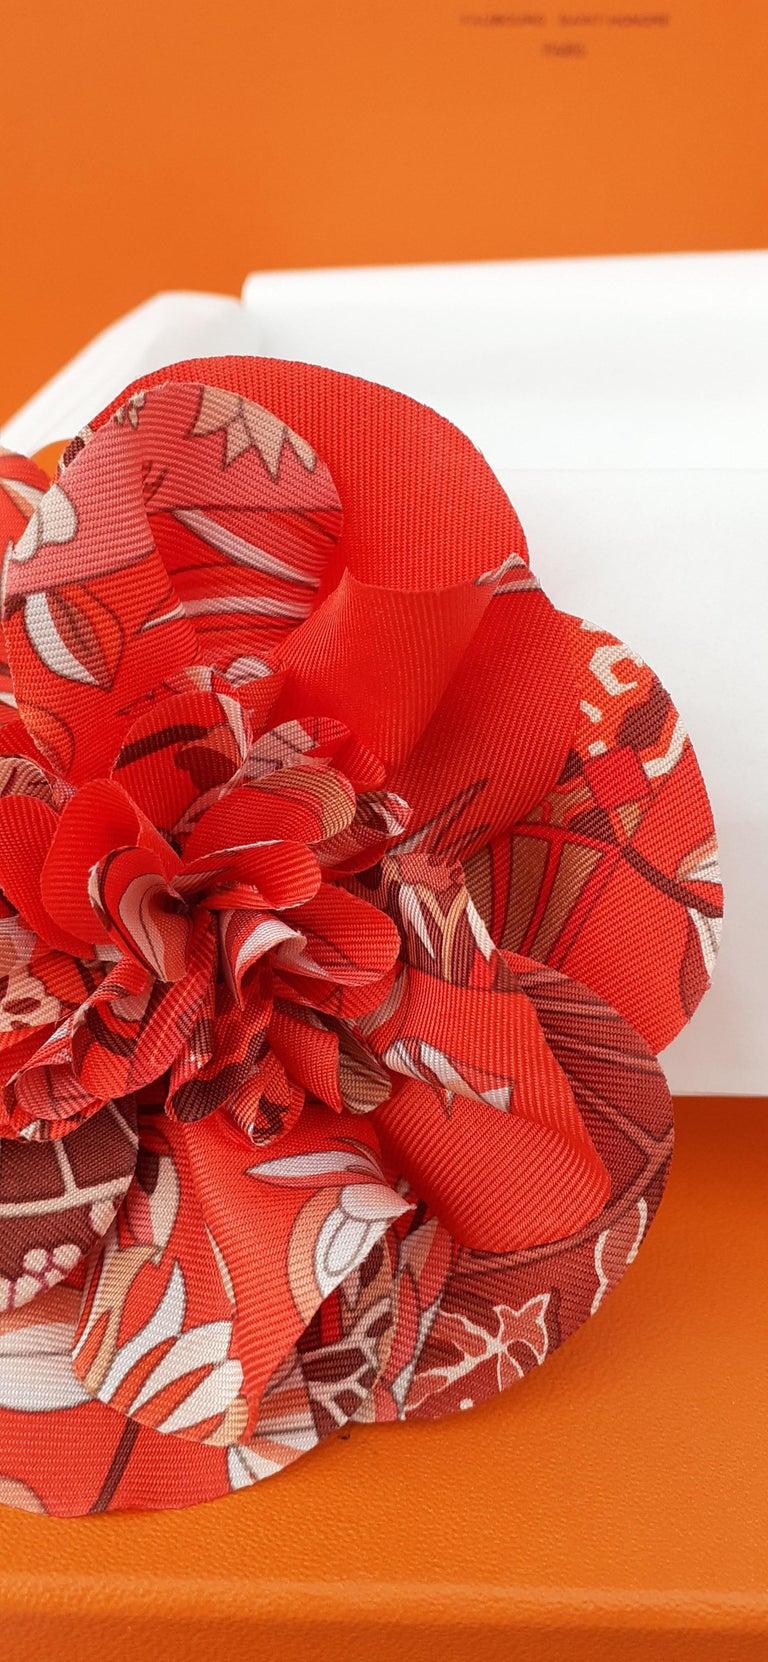 Exceptional Hermès Rare Silk Scarf Brooch Charm La Fleur Red 1